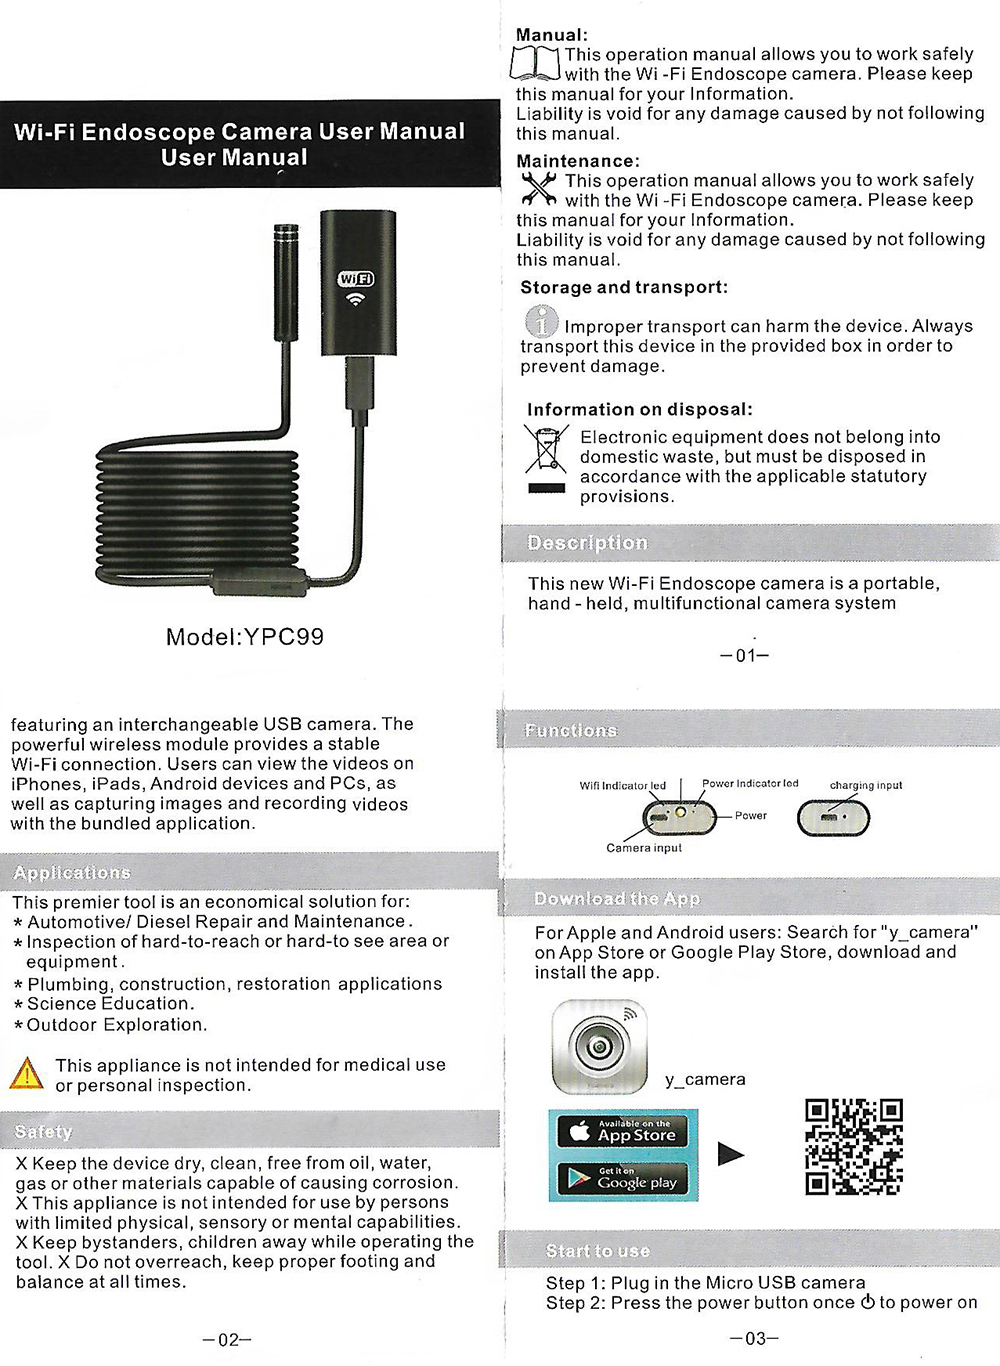 Hard Cable 720P Wifi Endoscope Camera 8mm Waterproof Endoscope Android iOS  Smart Phone Endoscope Pipe Wi-fi Wi fi Mini Camera